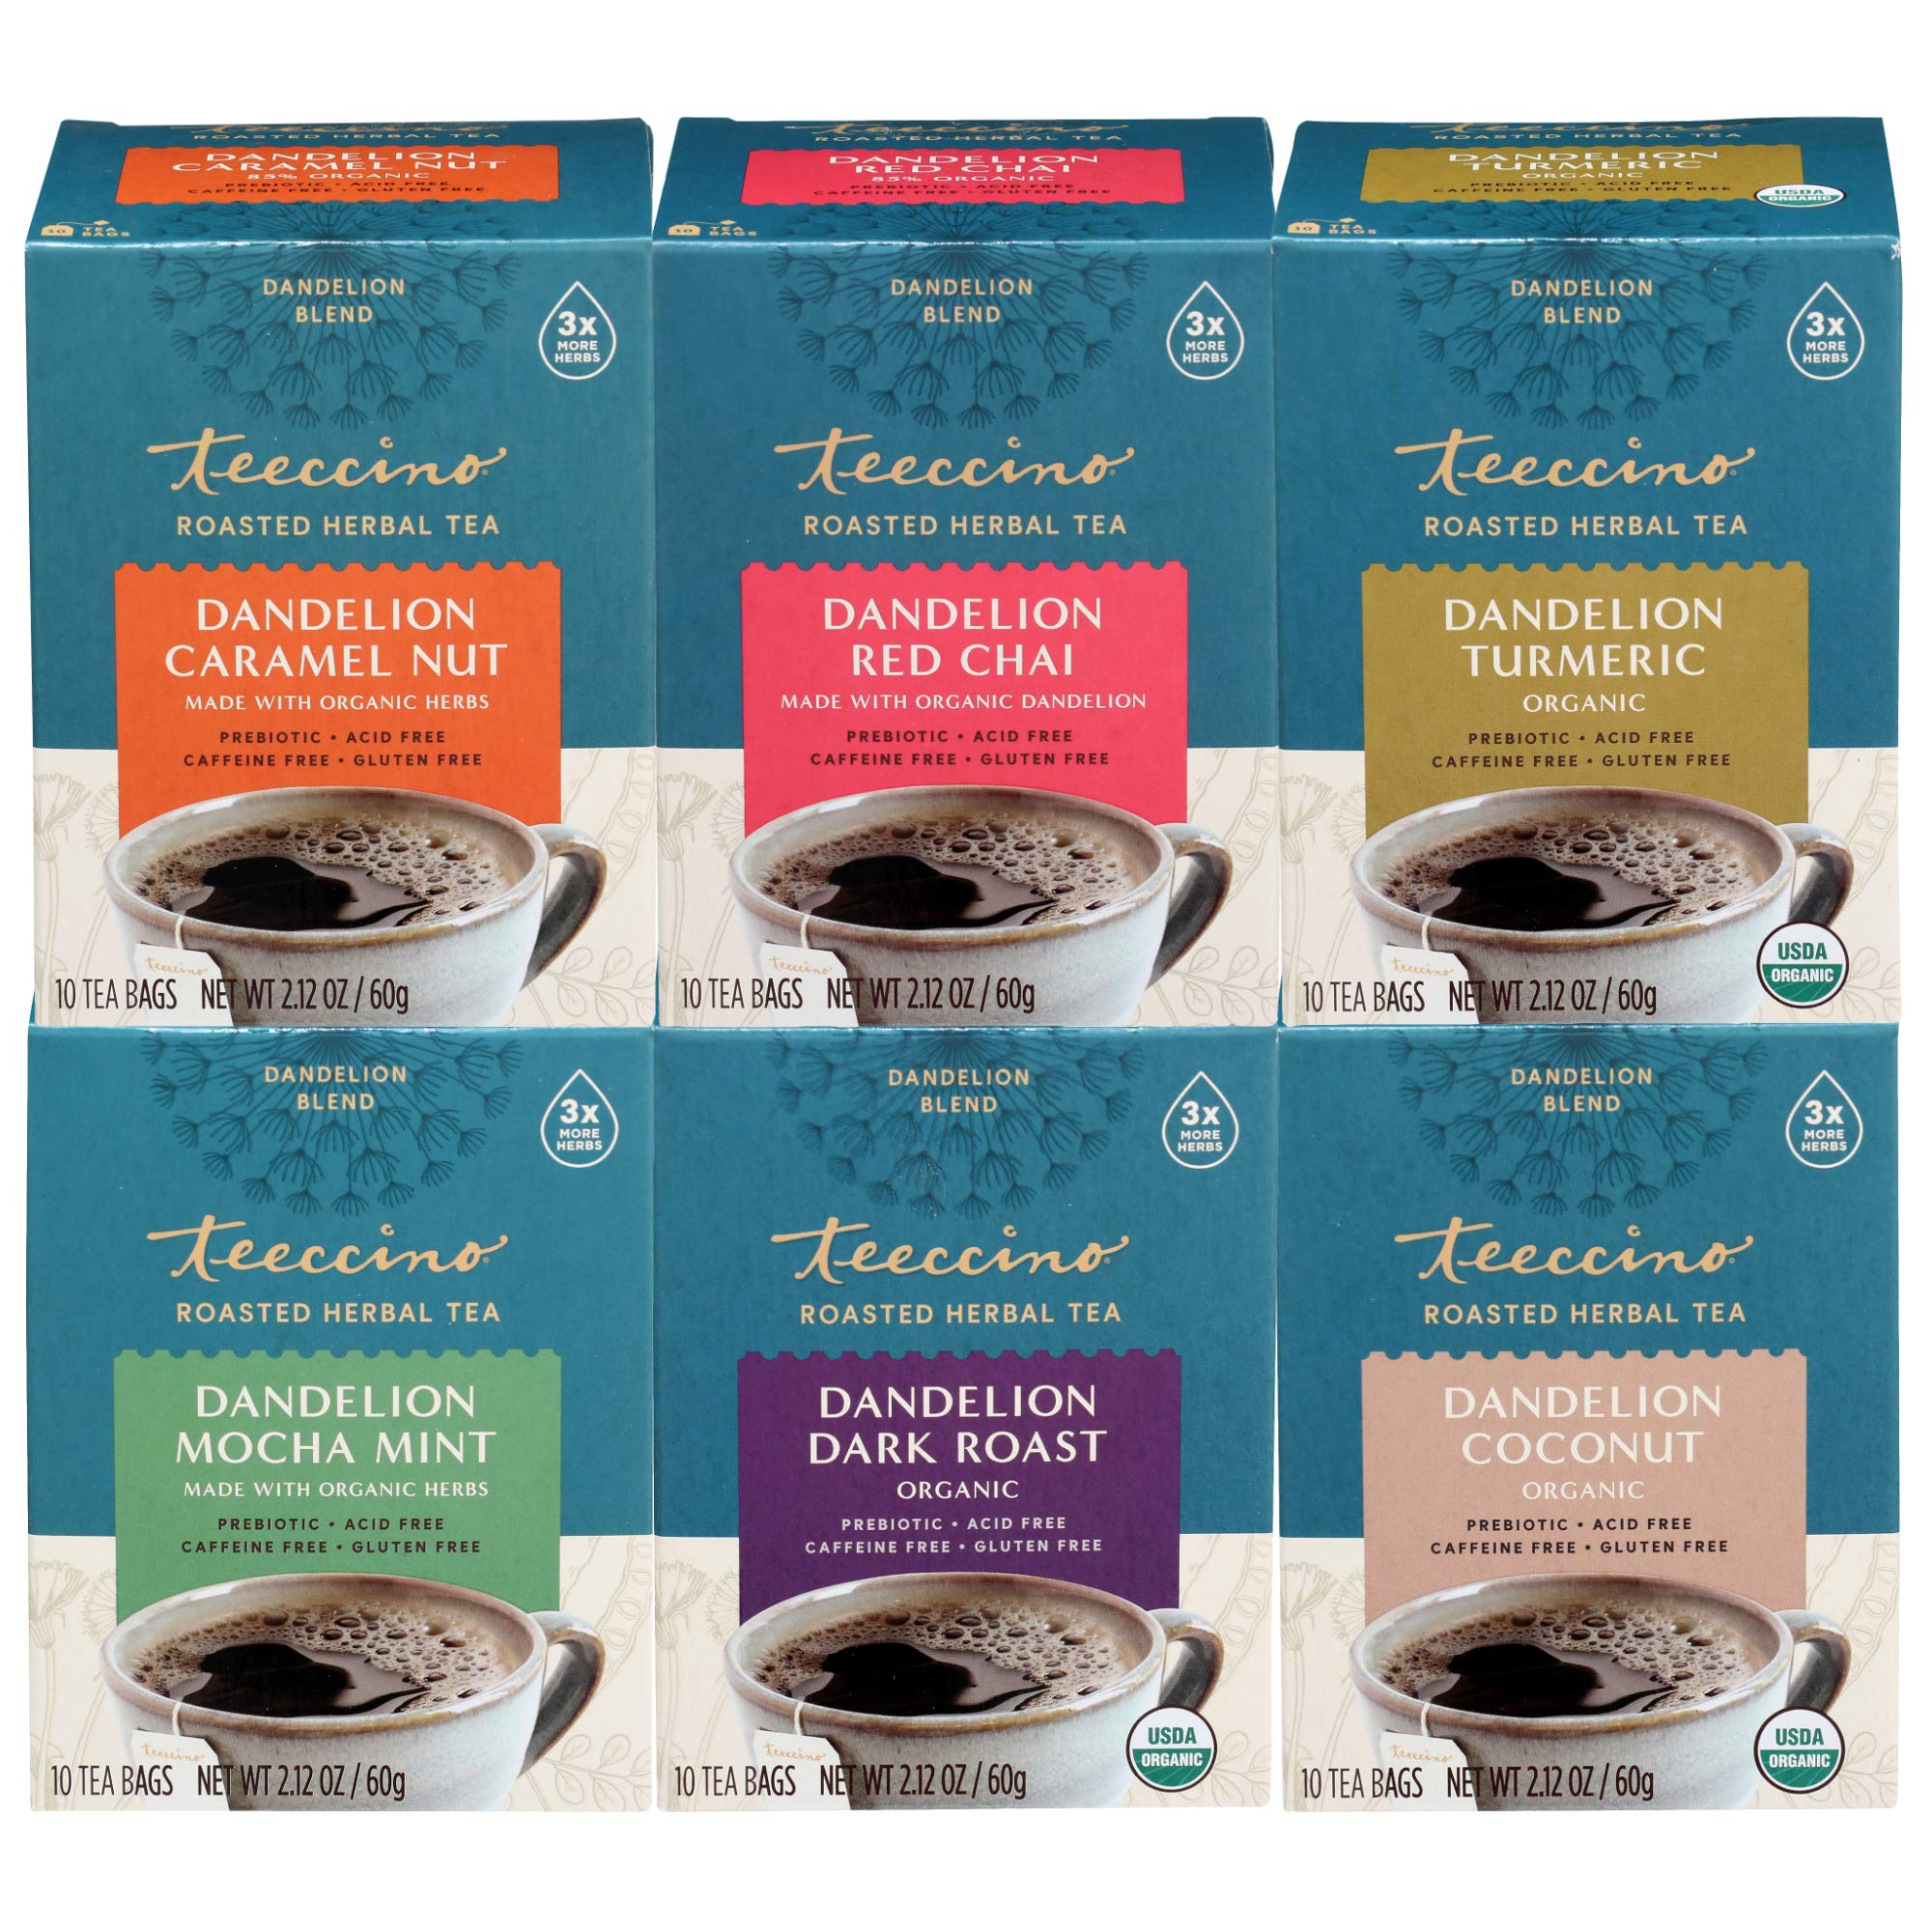 Teeccino Dandelion Tea Variety Pack - Dark Roast, Caramel Nut, Mocha Mint, Turmeric, Red Chai, Coconut – Acid Free Coffee Alternative, Prebiotic, Gluten Free, Caffeine Free, 10 Tea Bag (Pack of 6)